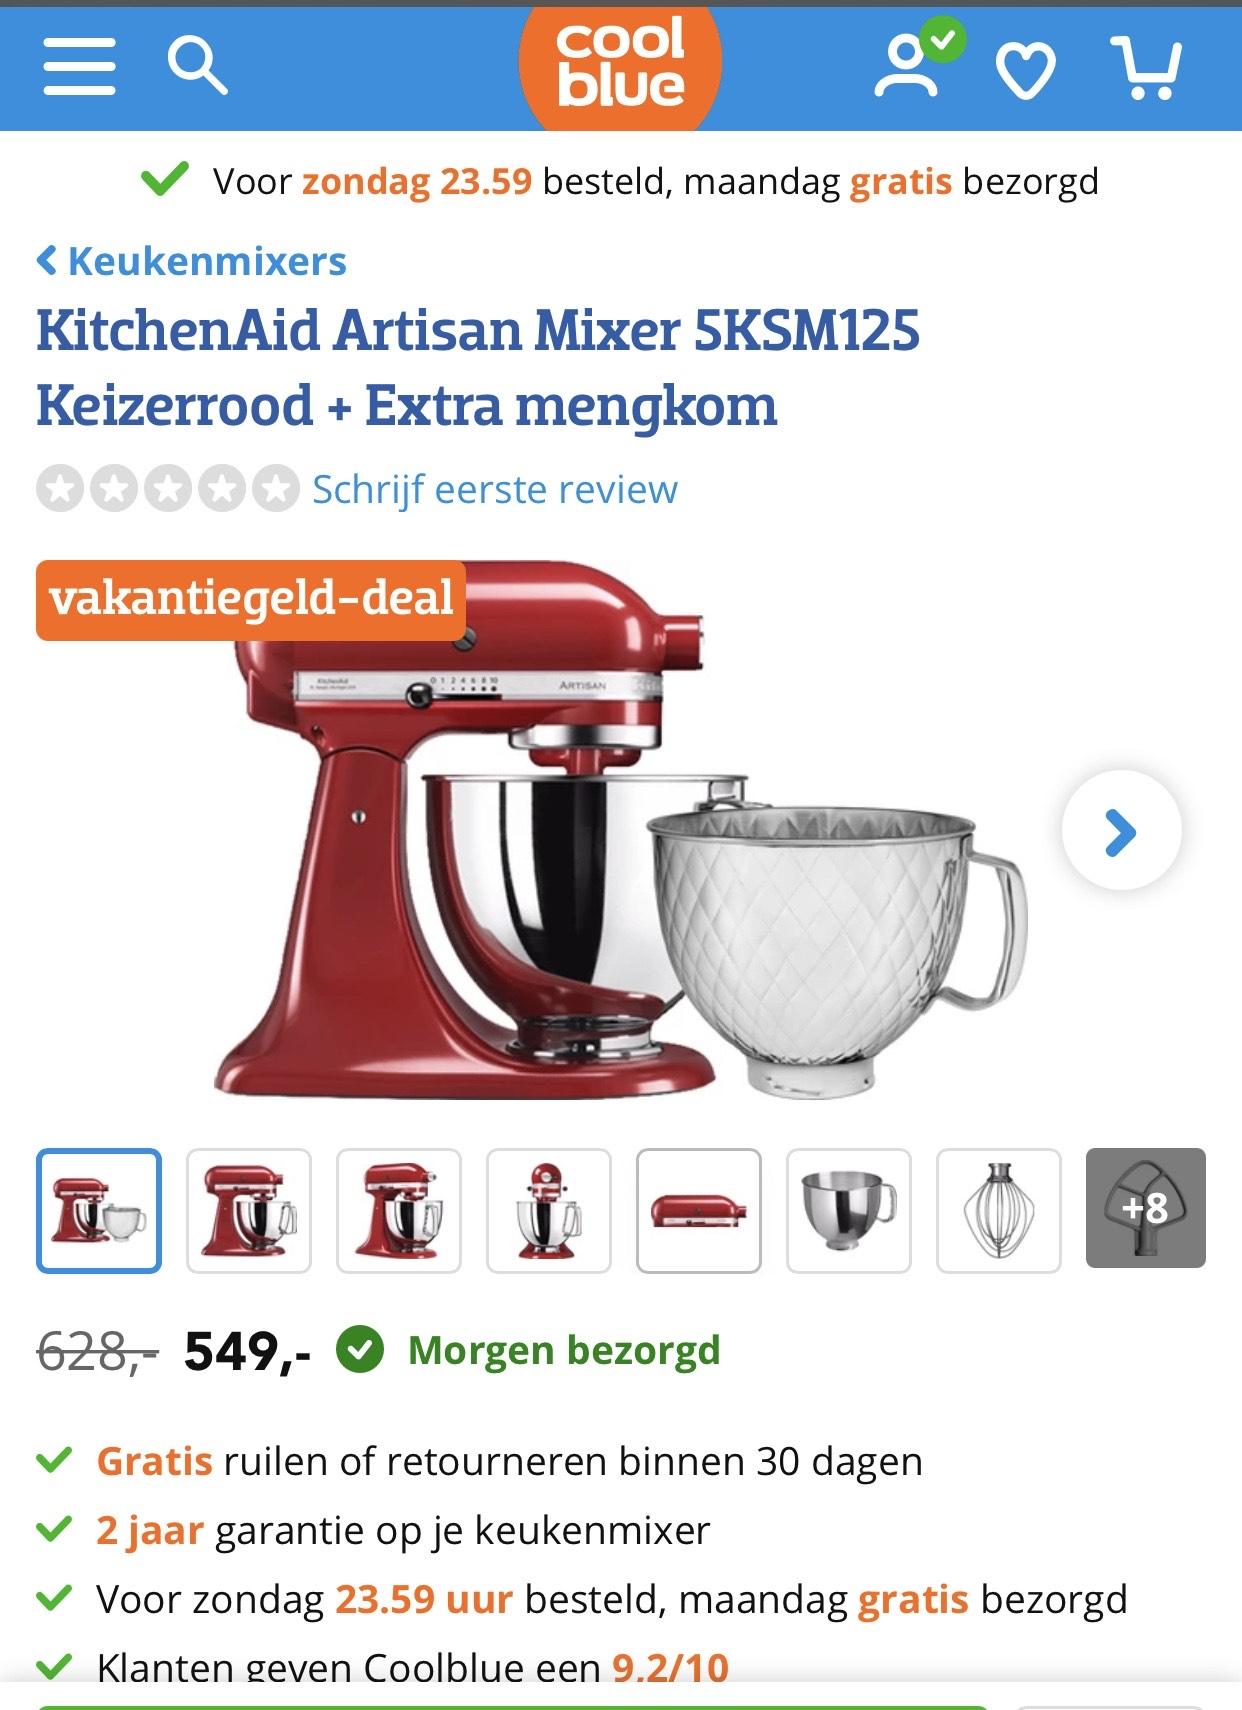 KitchenAid Artisan Mixer 5KSM125 Keizerrood + Extra mengkom